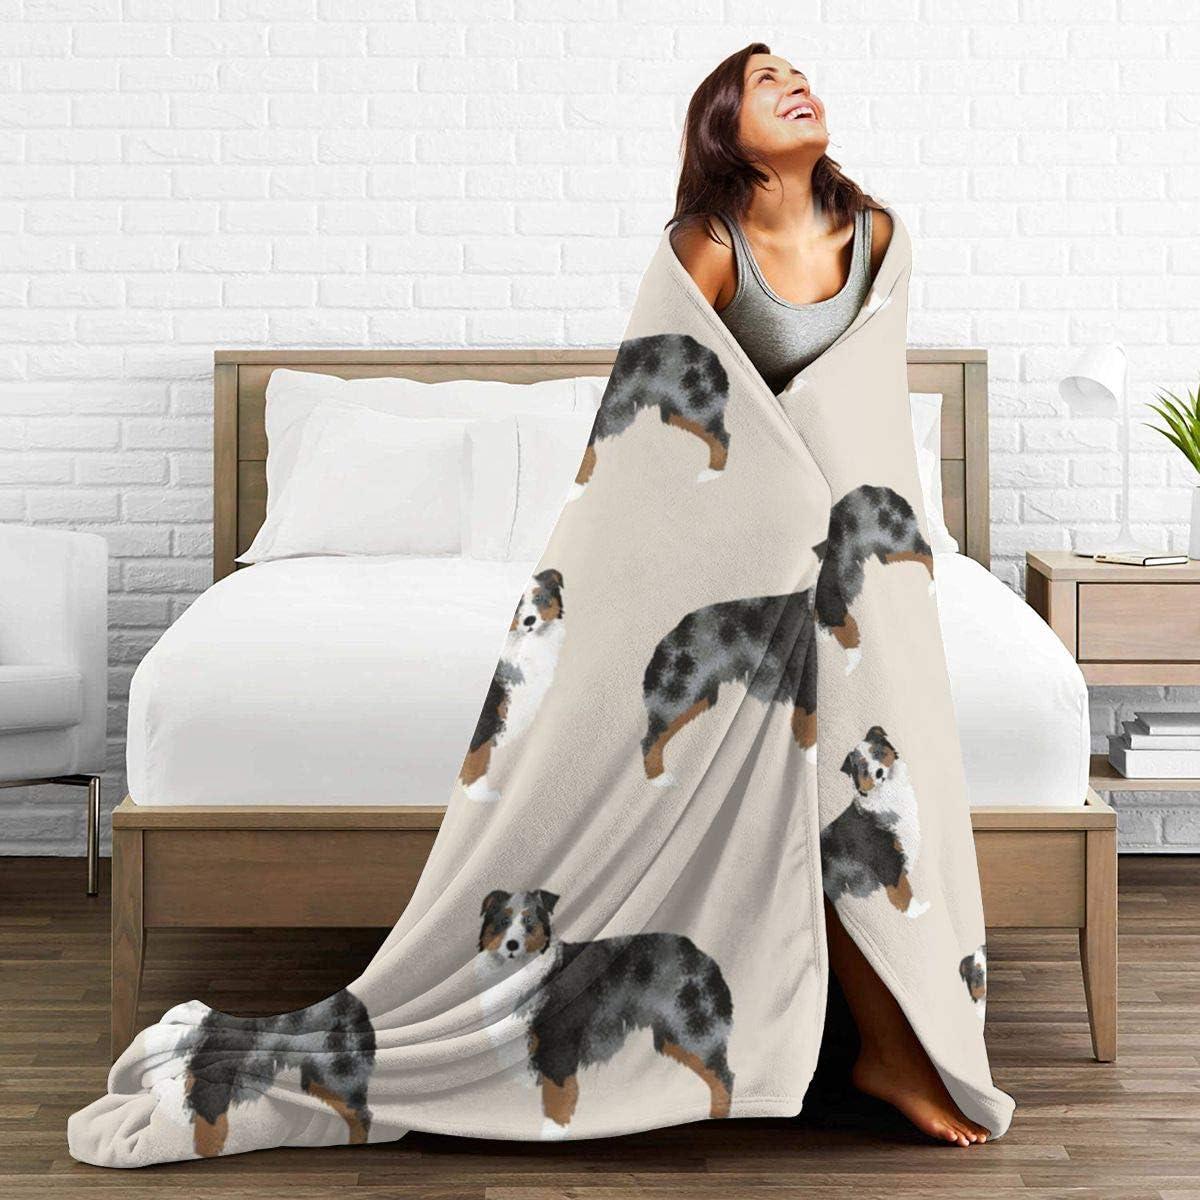 NOT Australian Shepherd Flannel Blanket Super Soft and Comfortable Fuzzy Luxury Warm Plush Microfiber Blanket Suitable for Bed Sofa Travel Four Seasons Blanket 50 x 40